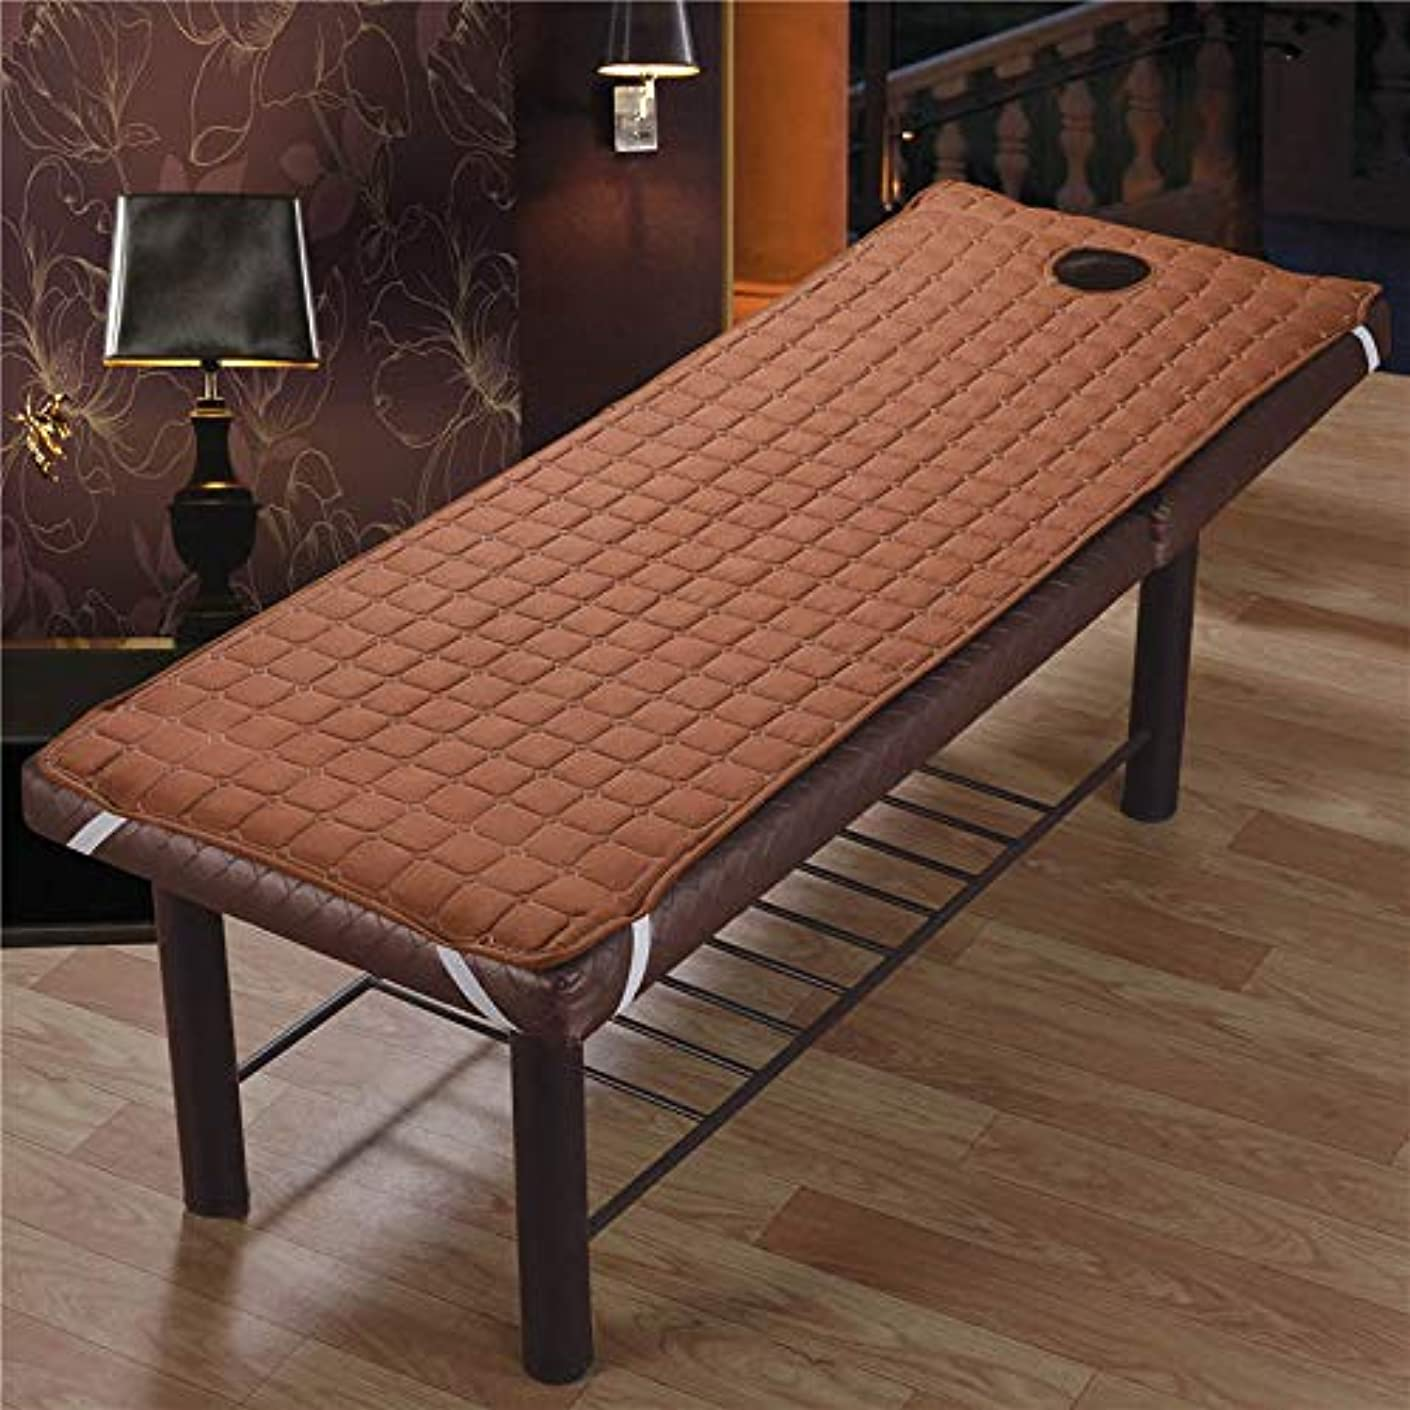 CoolTack  美容院のマッサージ療法のベッドのための滑り止めのSoliod色の長方形のマットレス